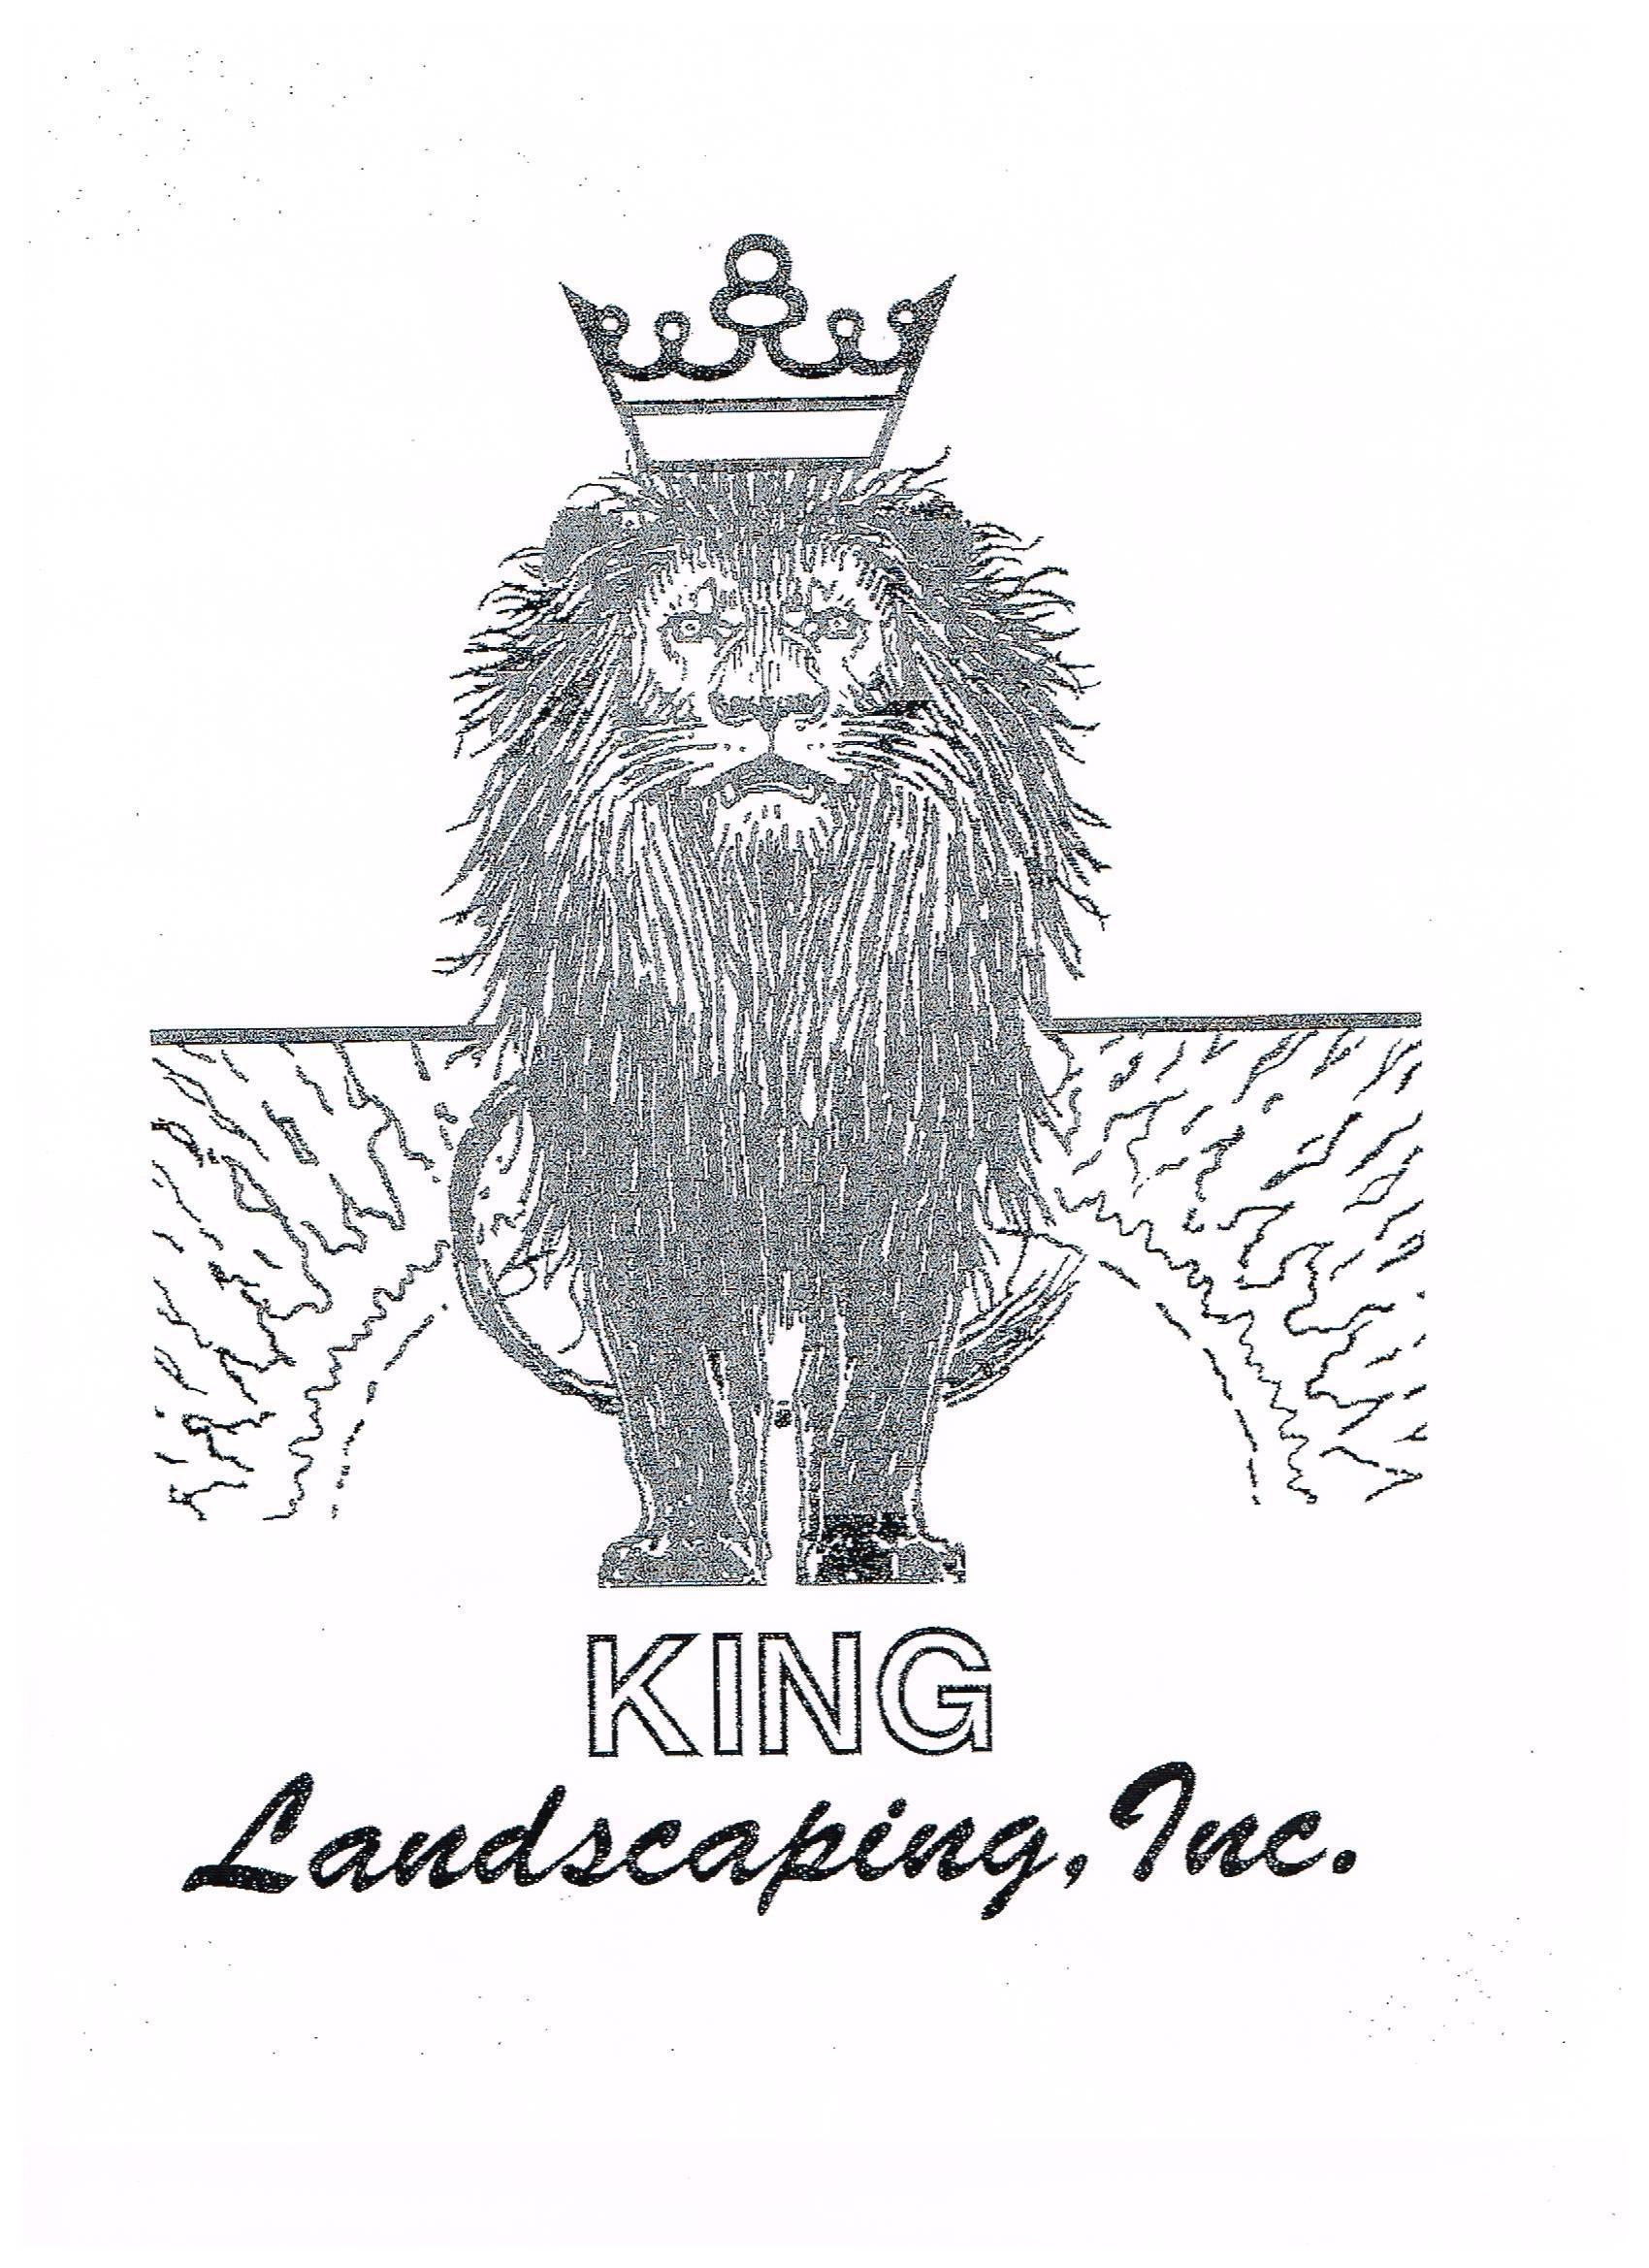 King Landscaping Inc.